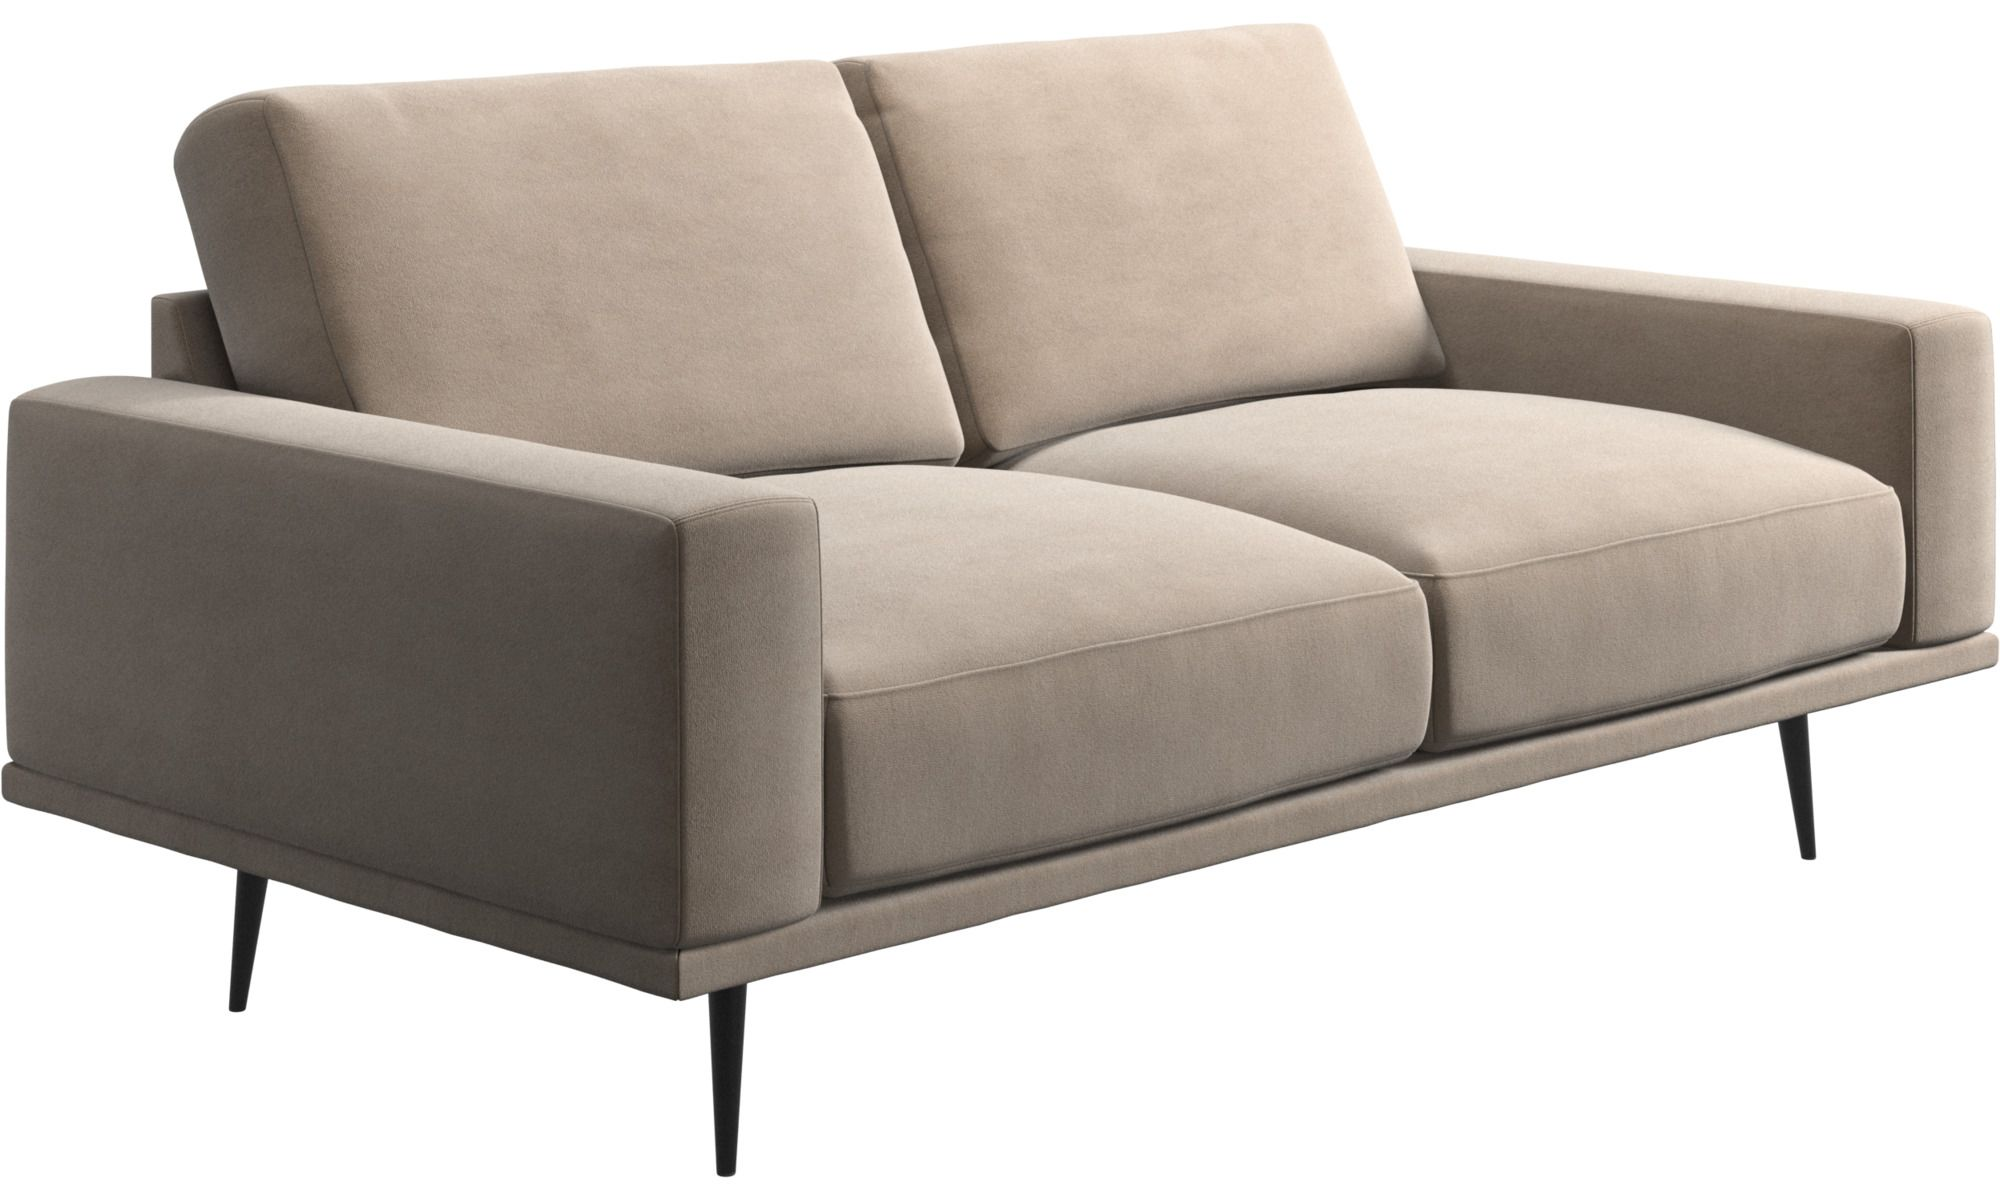 Carlton Sofa 2 Seater Sofa Seater Sofa Sofa